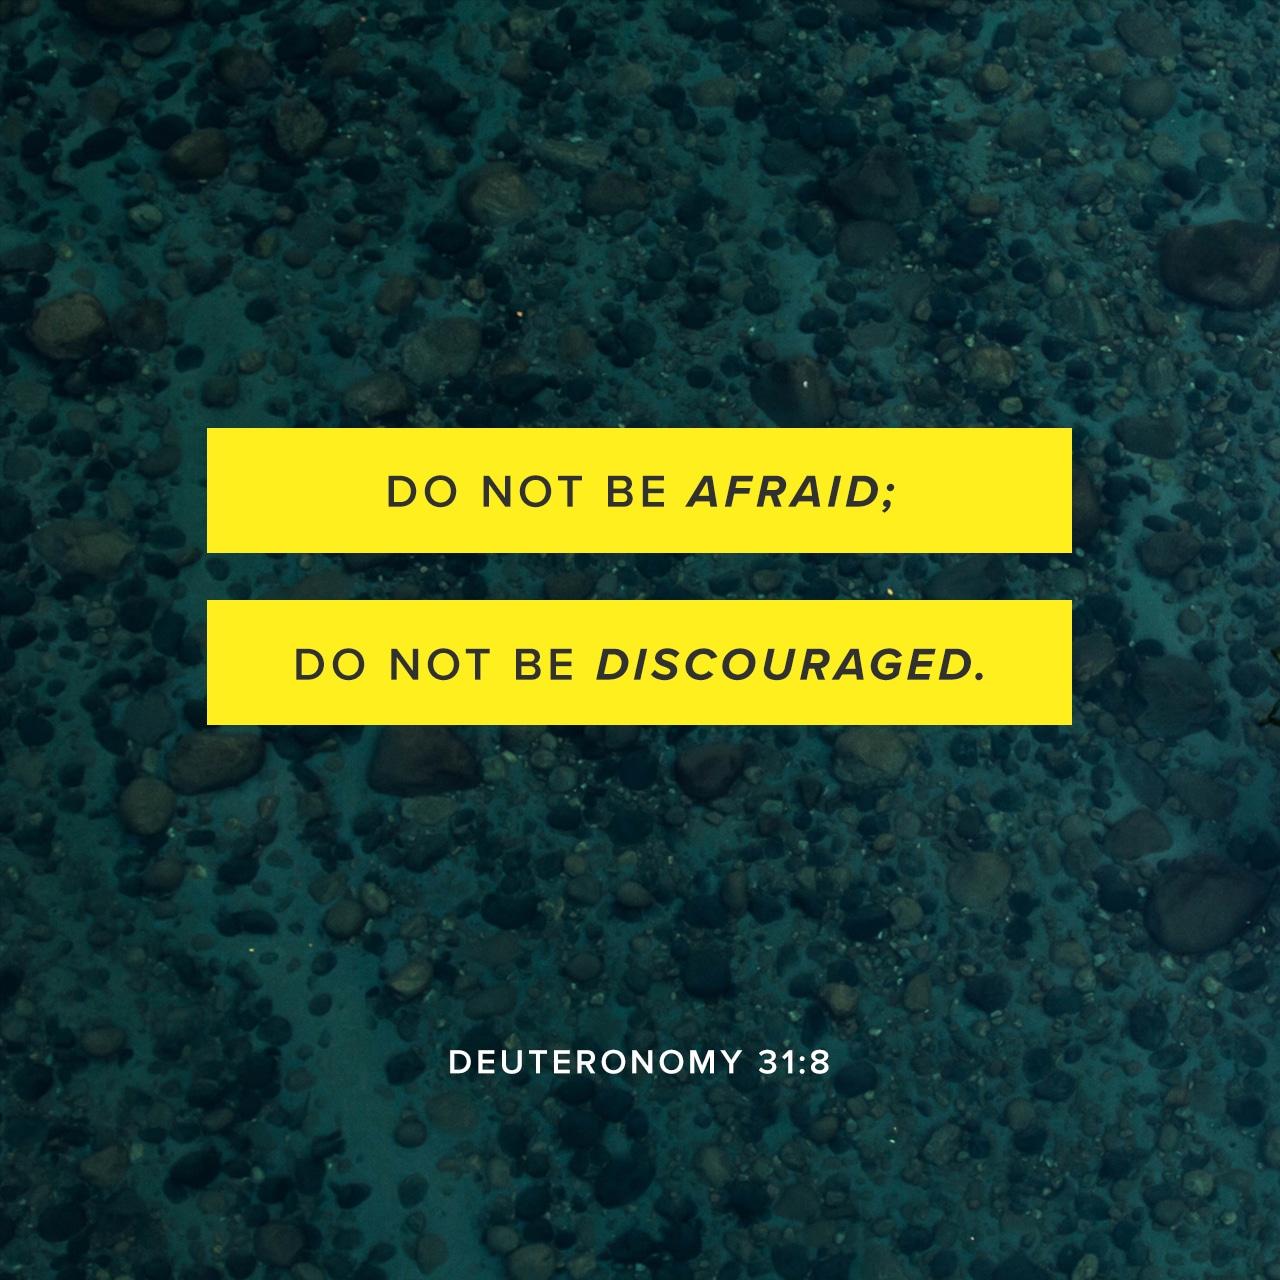 ScriptureArt_0817_-_Deuteronomy_31_8_NIV_English